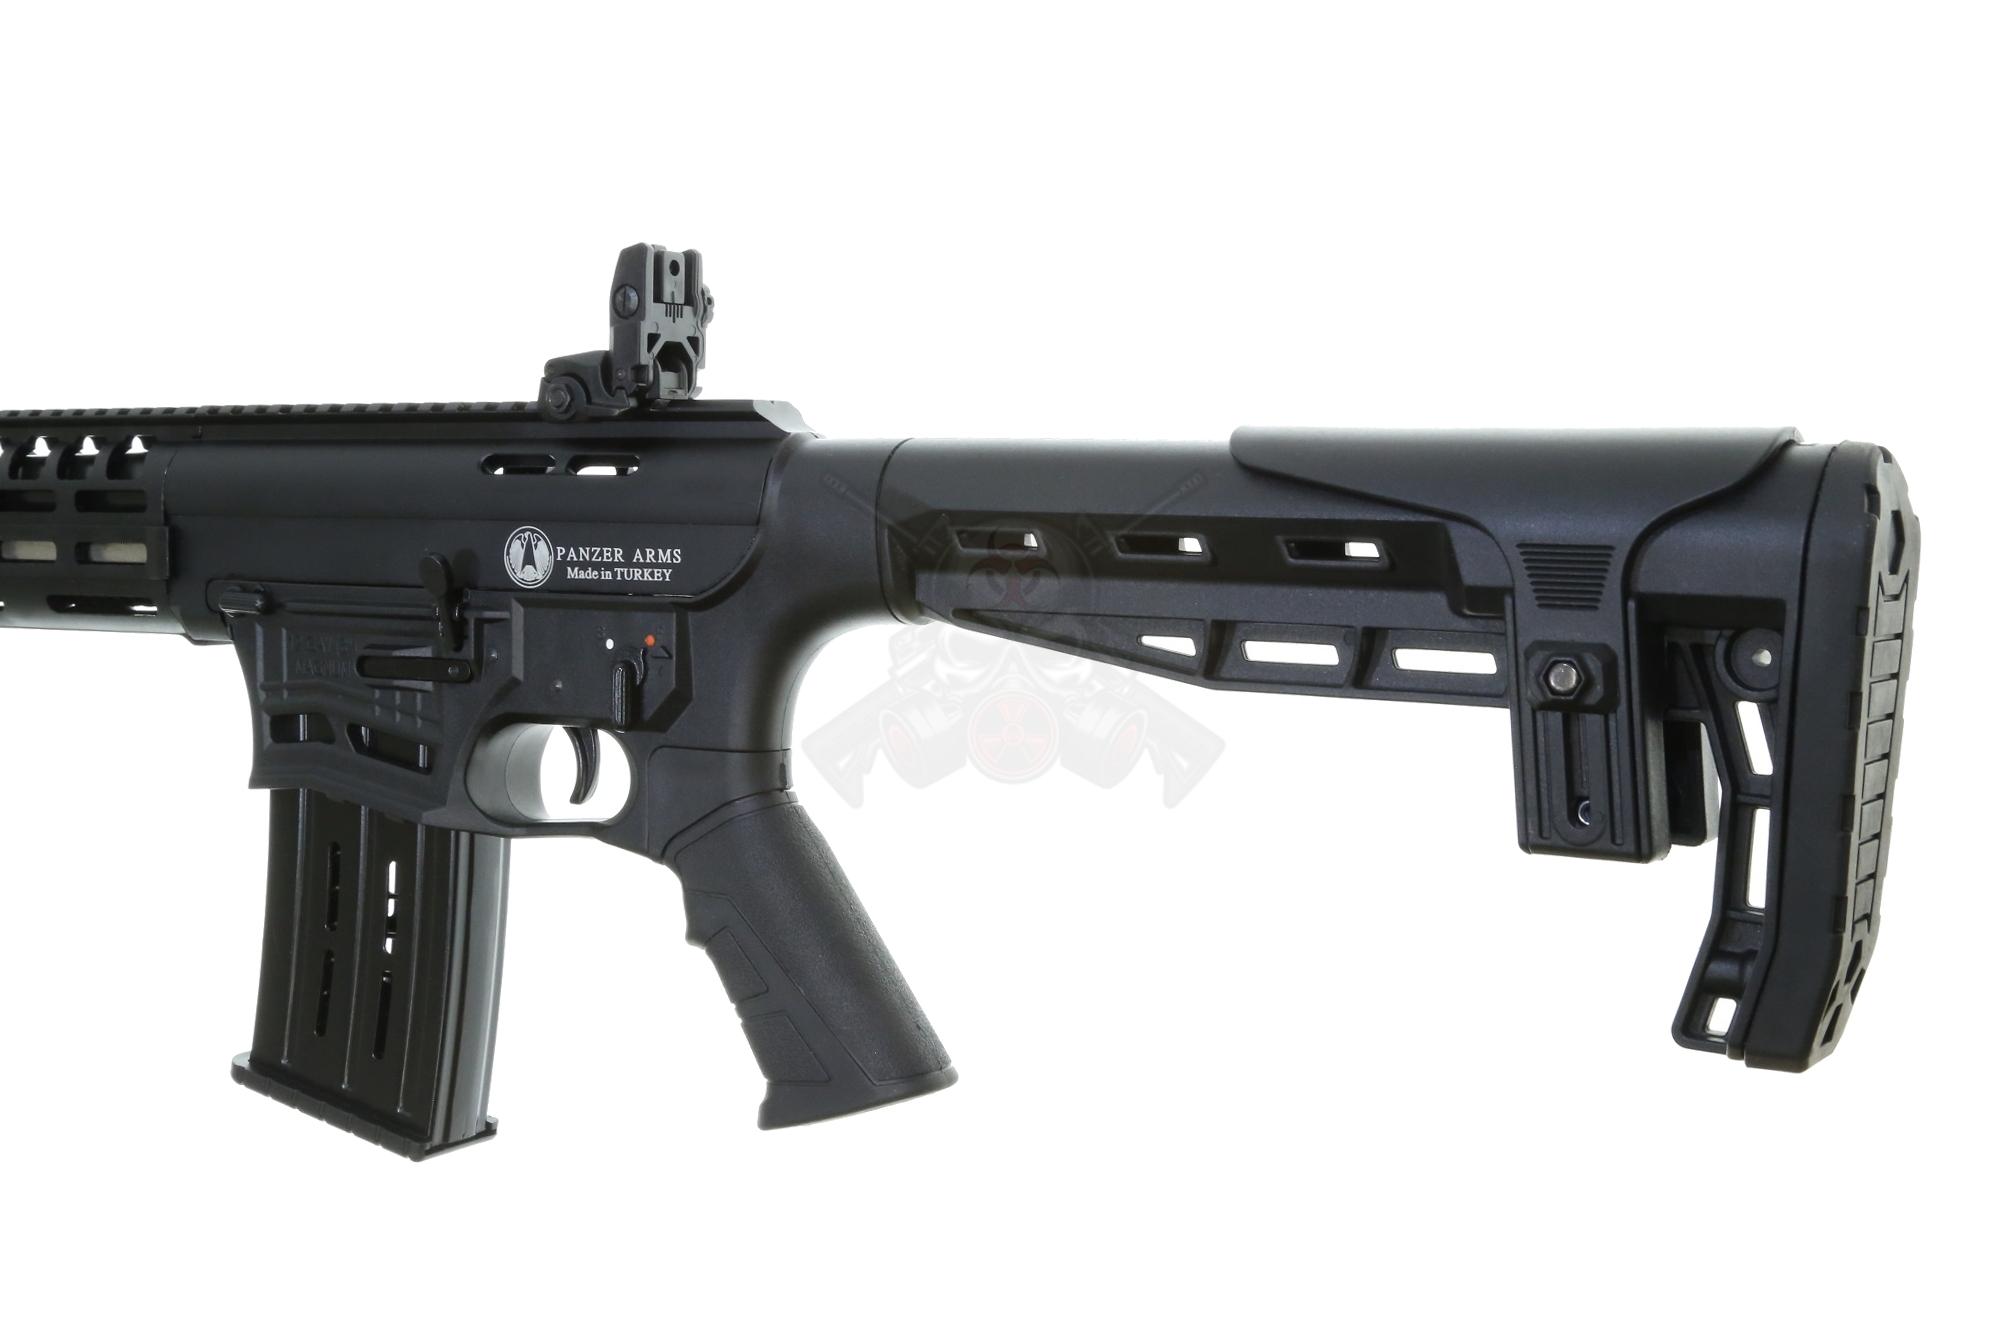 Panzer Arms AR-12 Shotgun 12GA 20